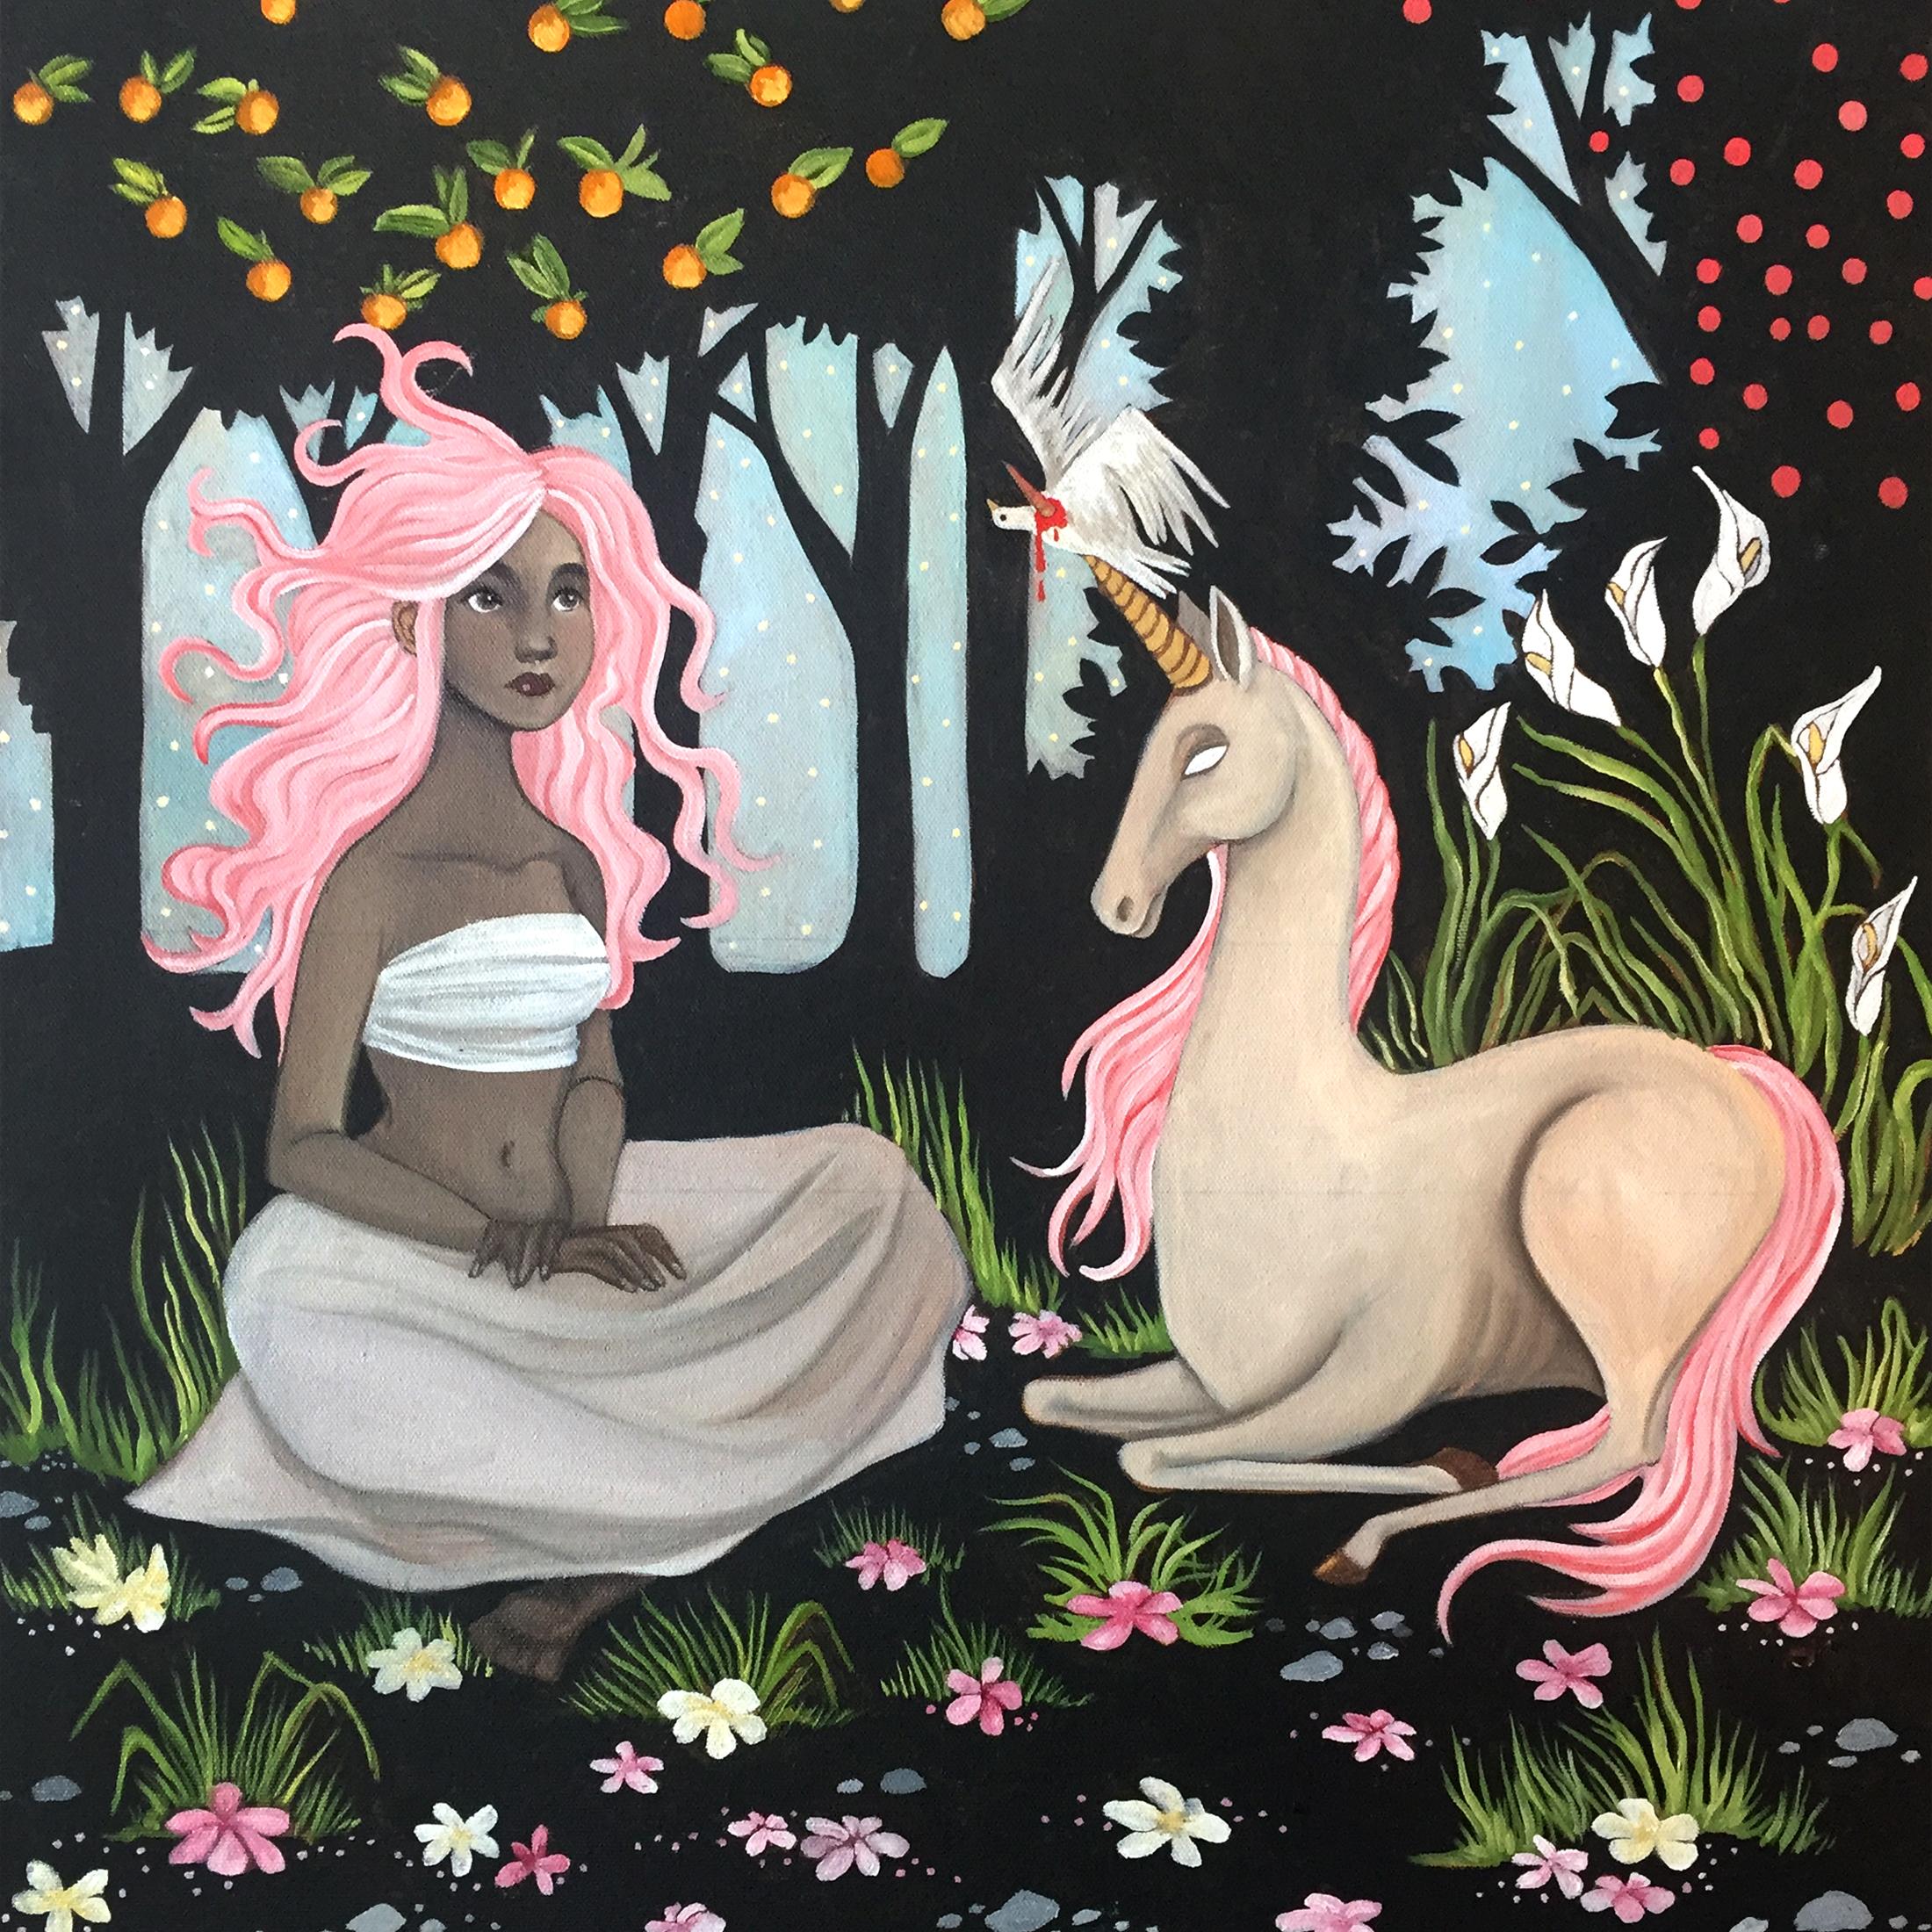 unicorn_whitneywoods.jpg